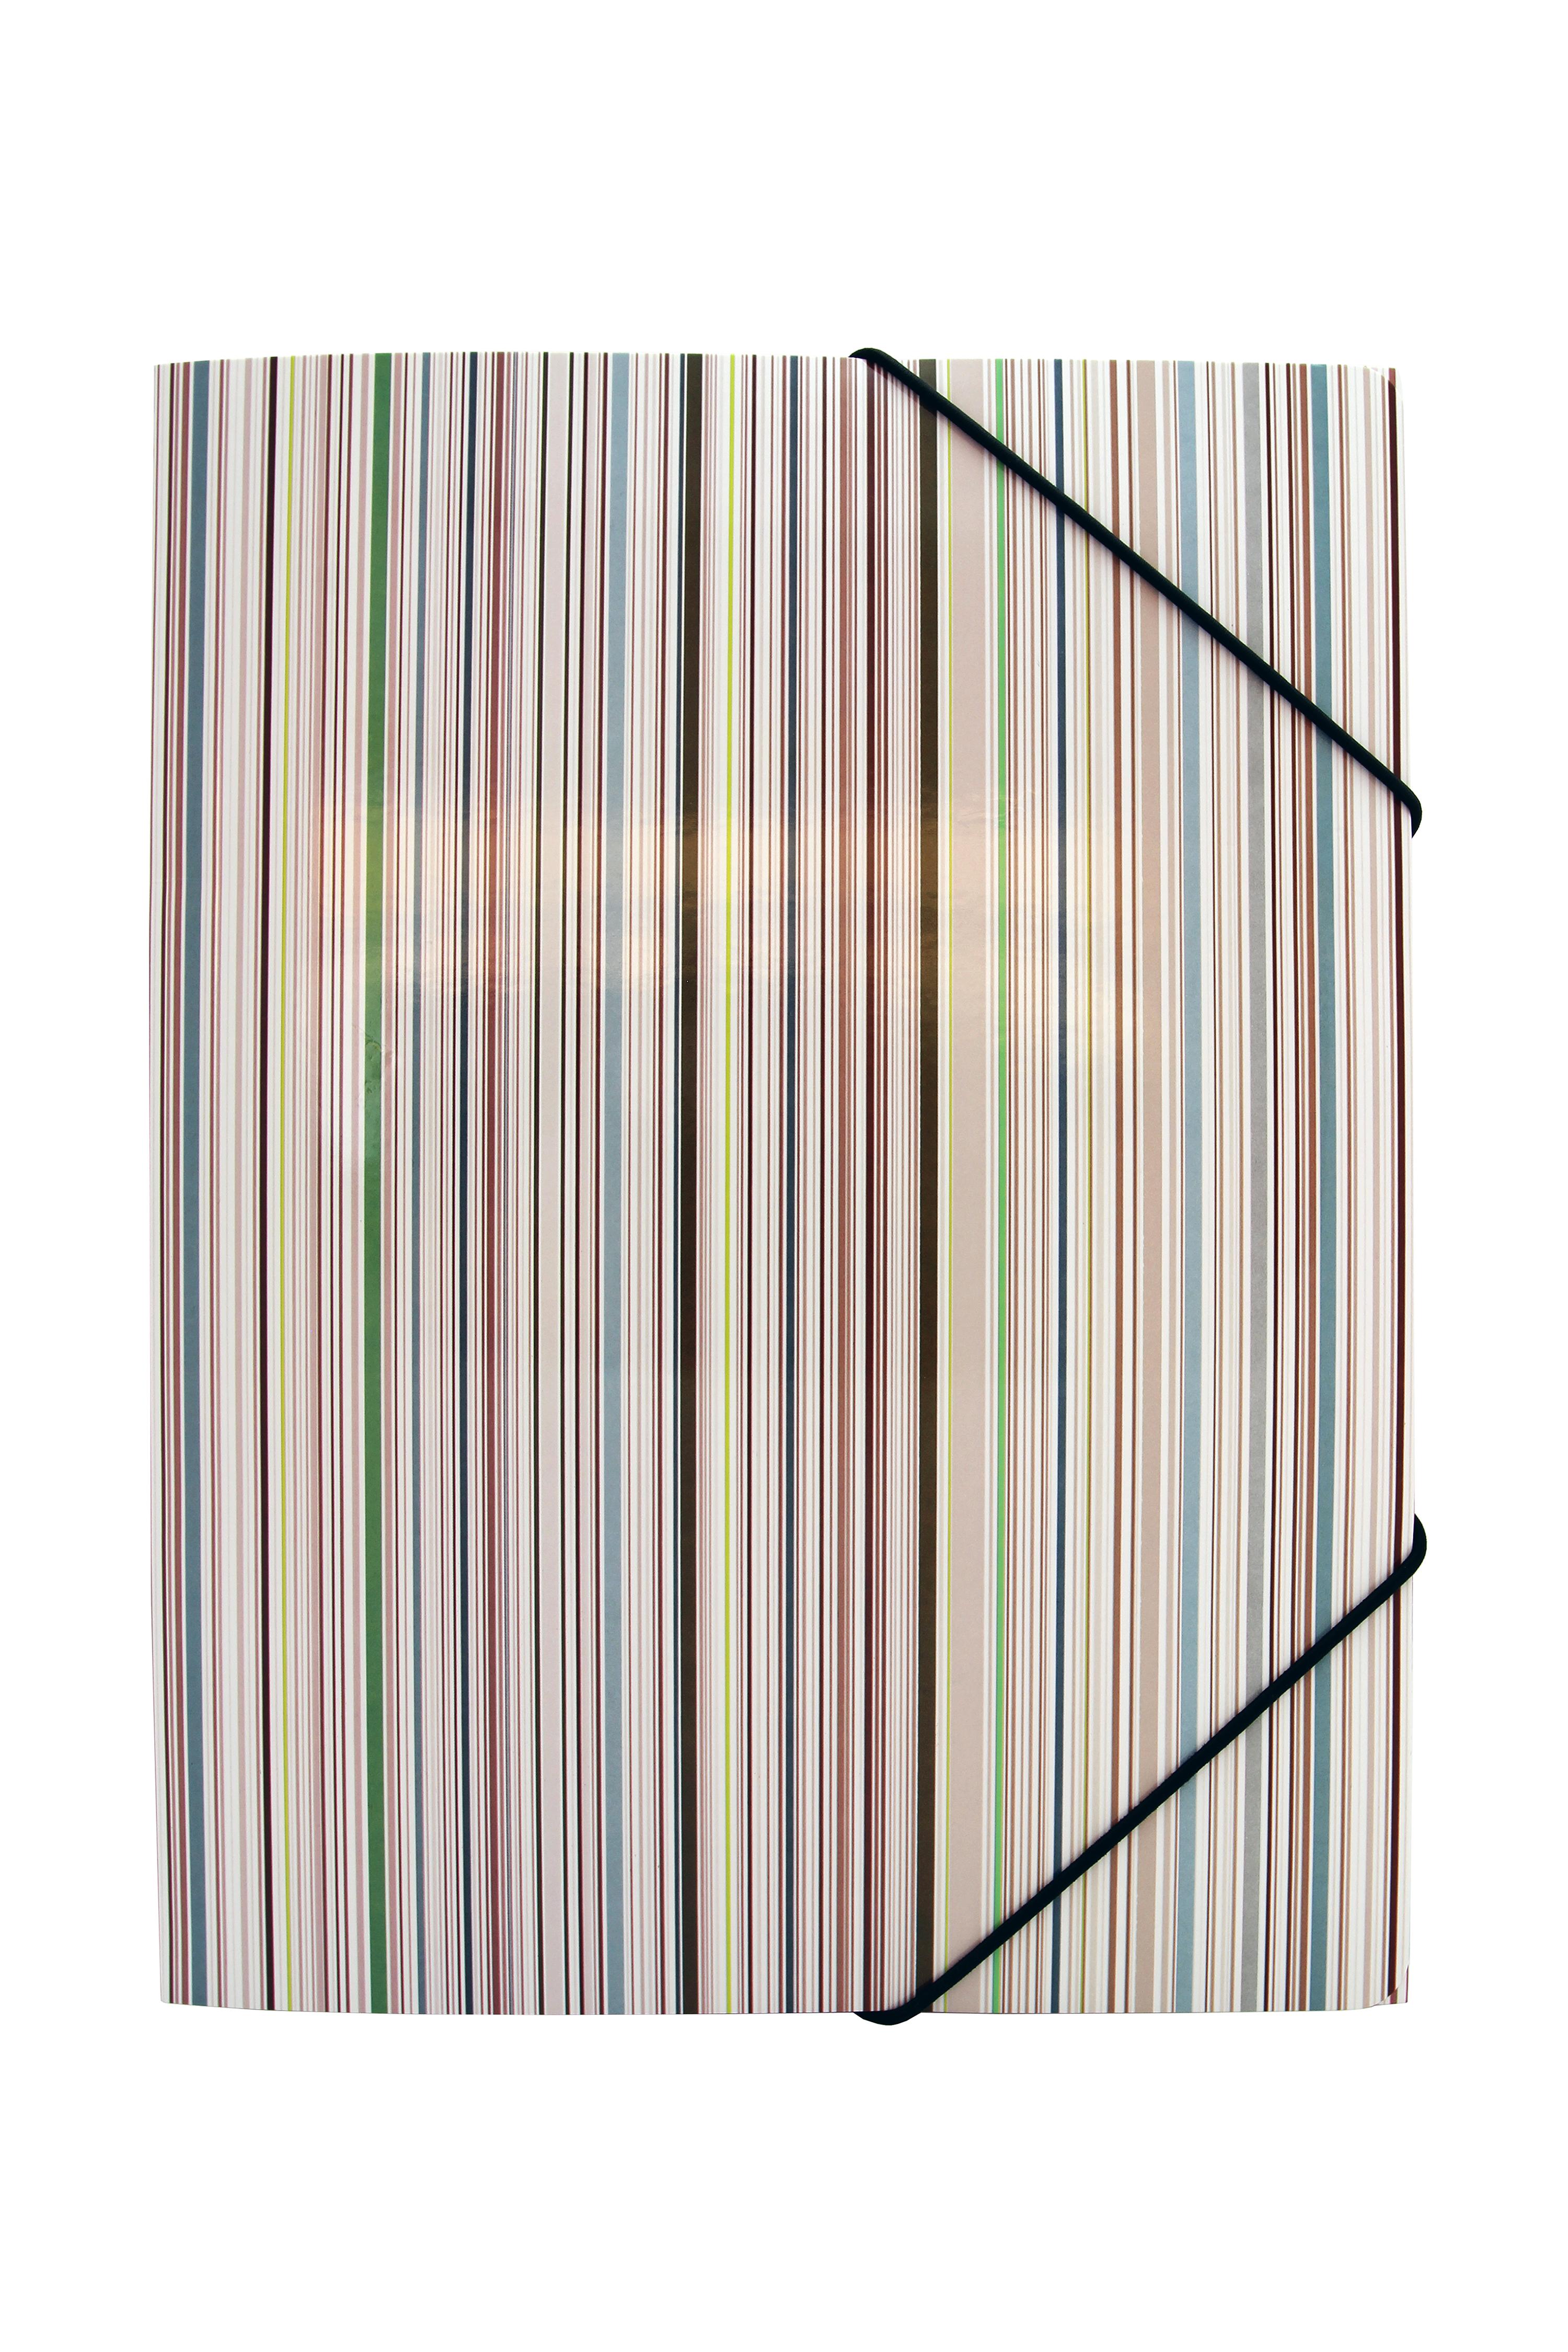 Image of   3-klap elastikmappe A4, karton, Ocean